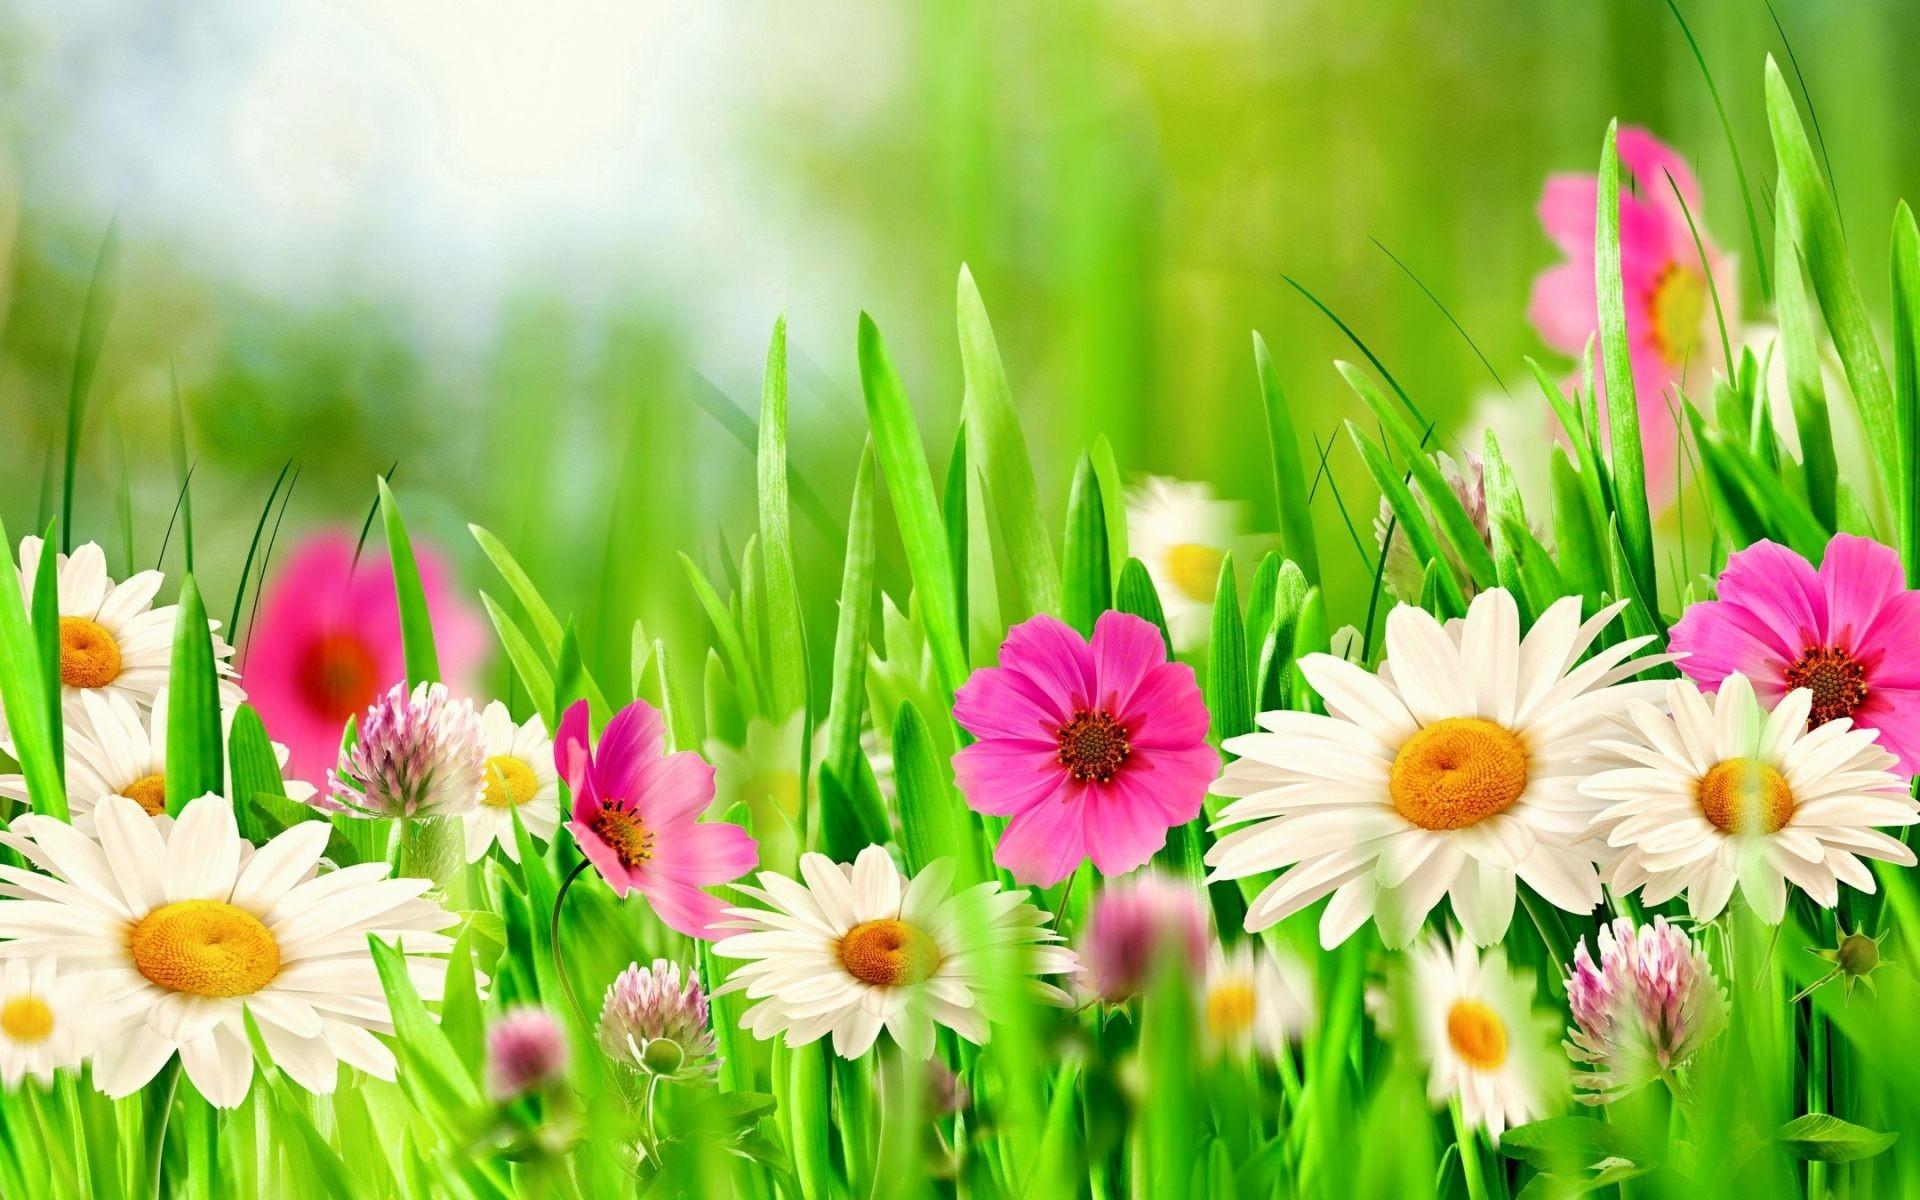 High Quality Spring Flowers Wallpaper   Full HD Pics